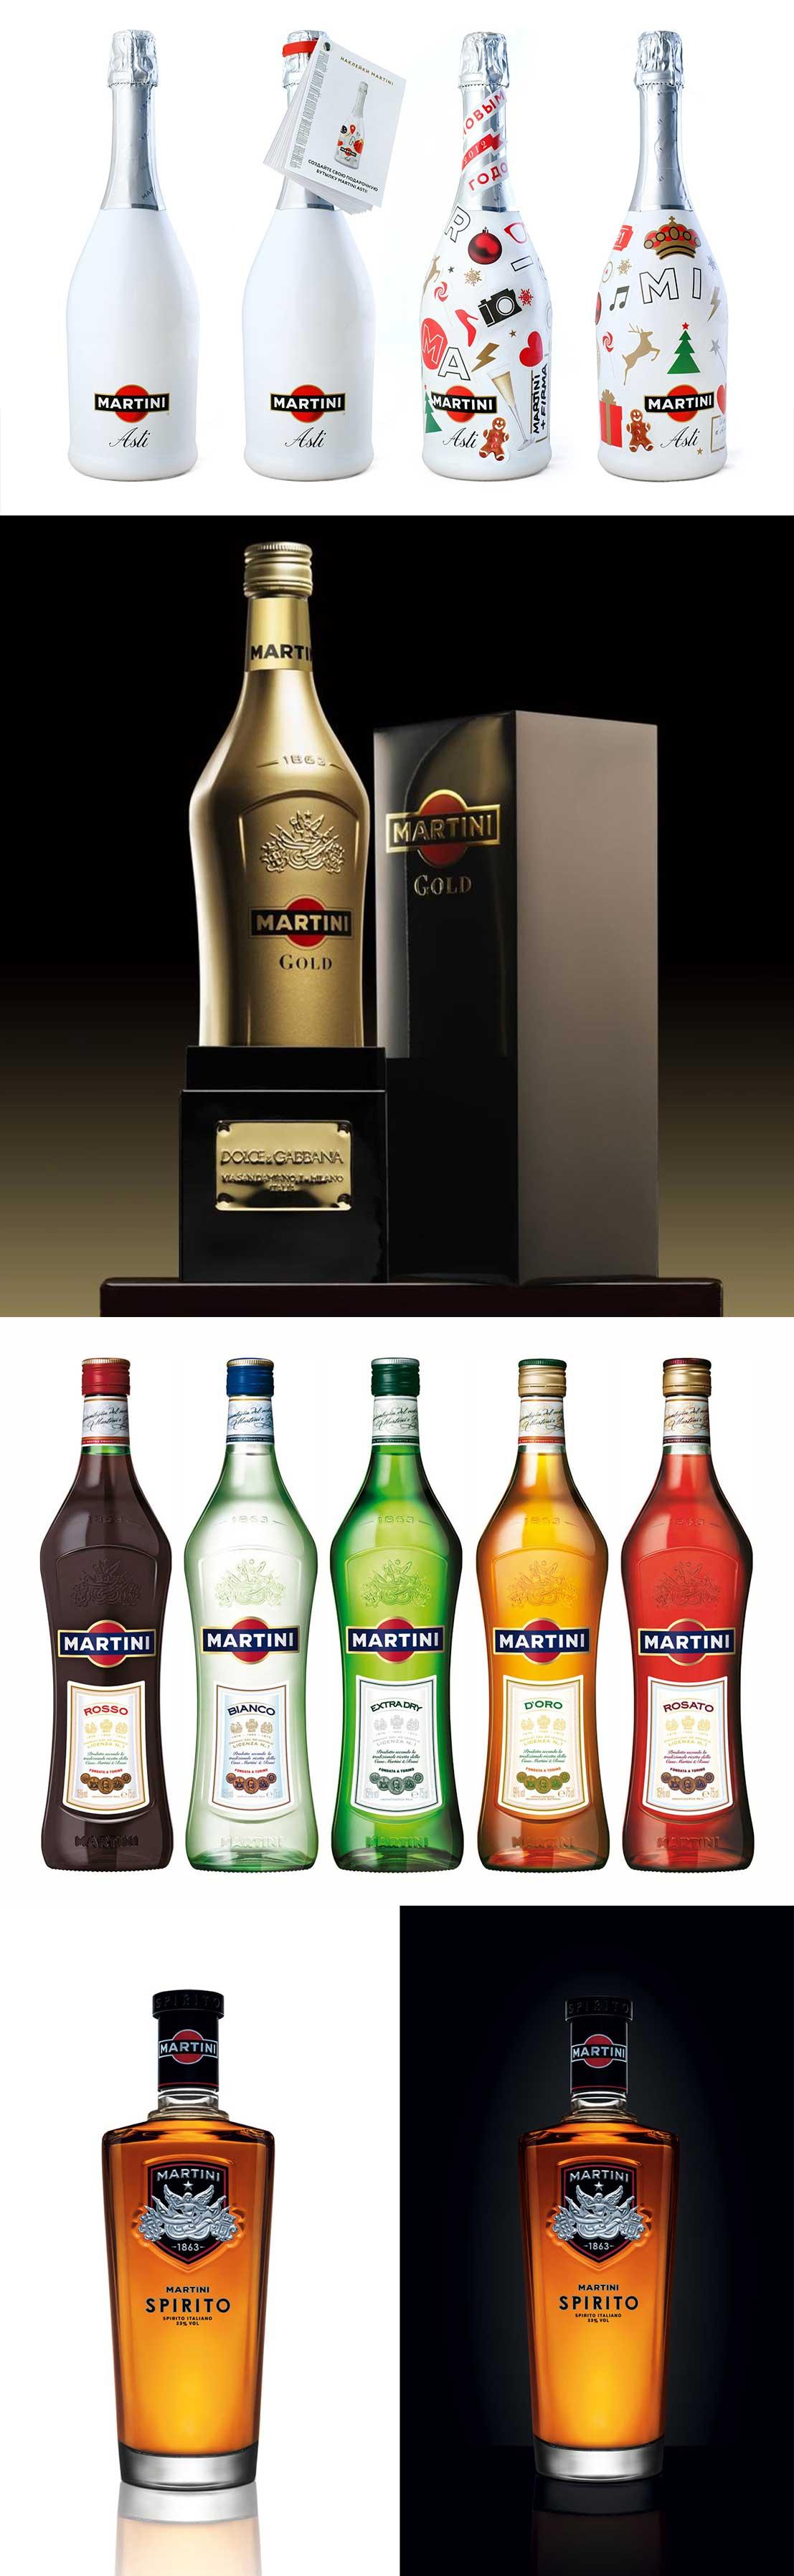 Дизайн бутылки мартини